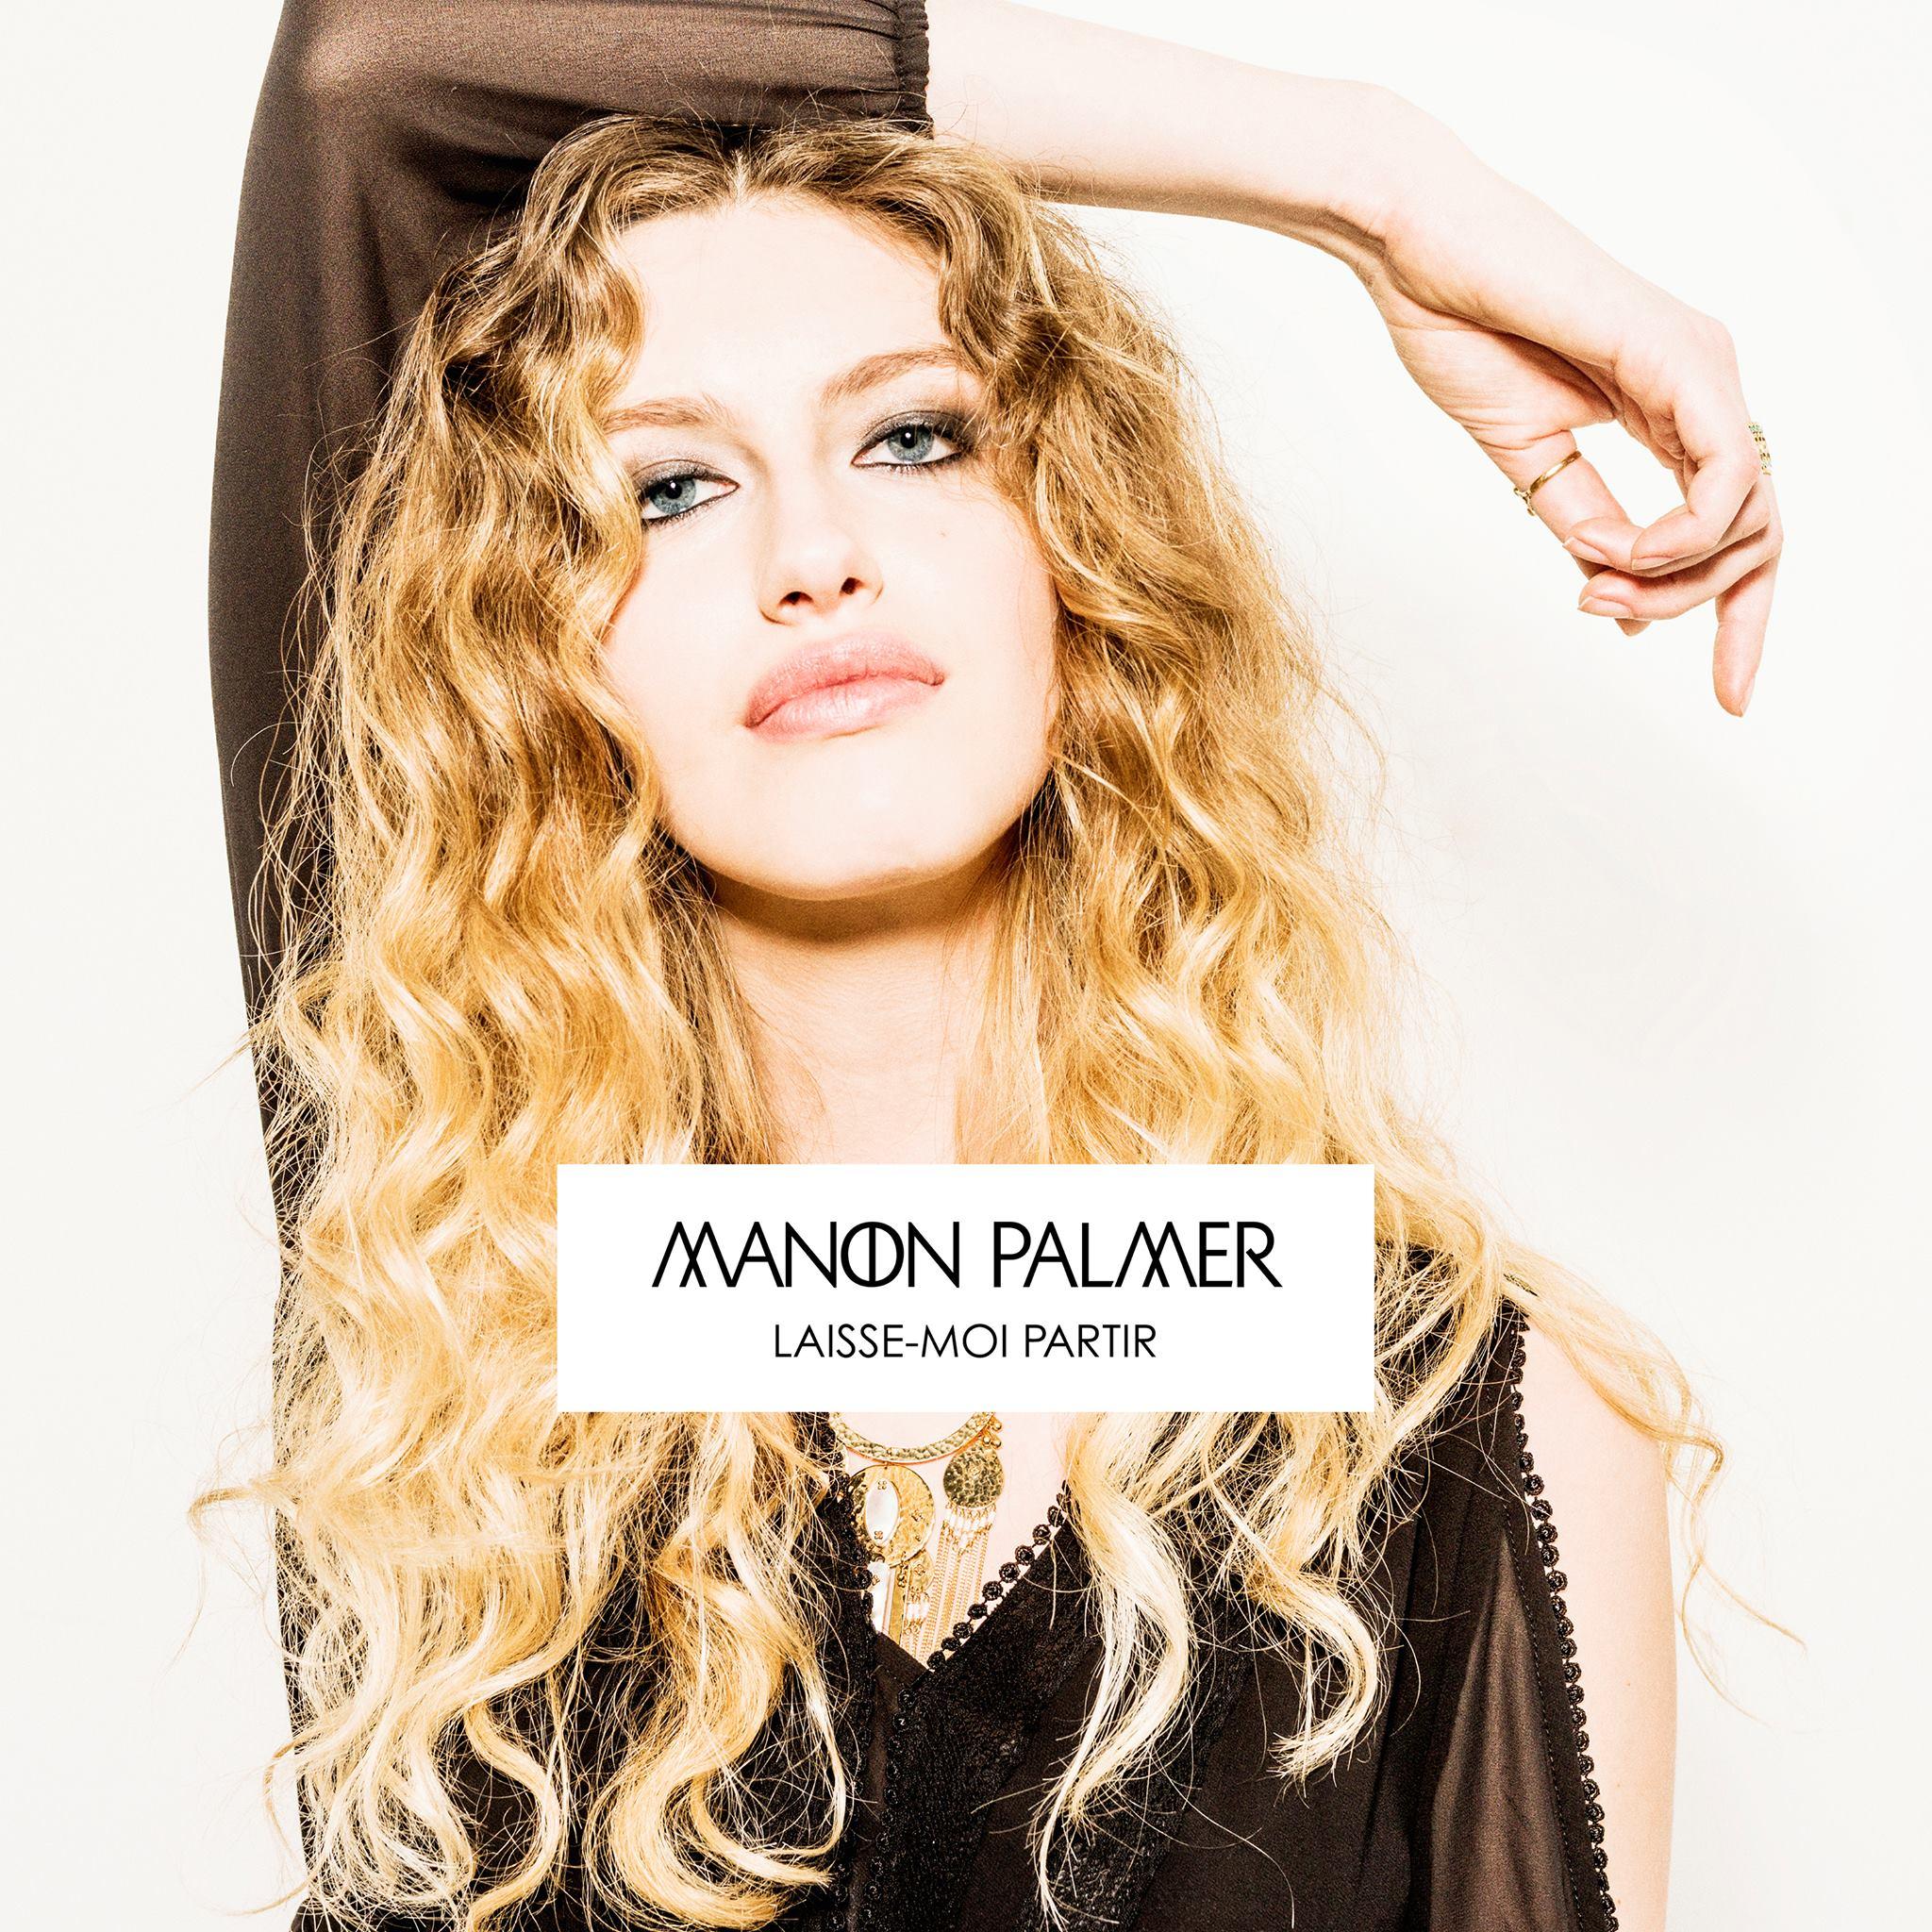 Manon Palmer JustMusic.fr